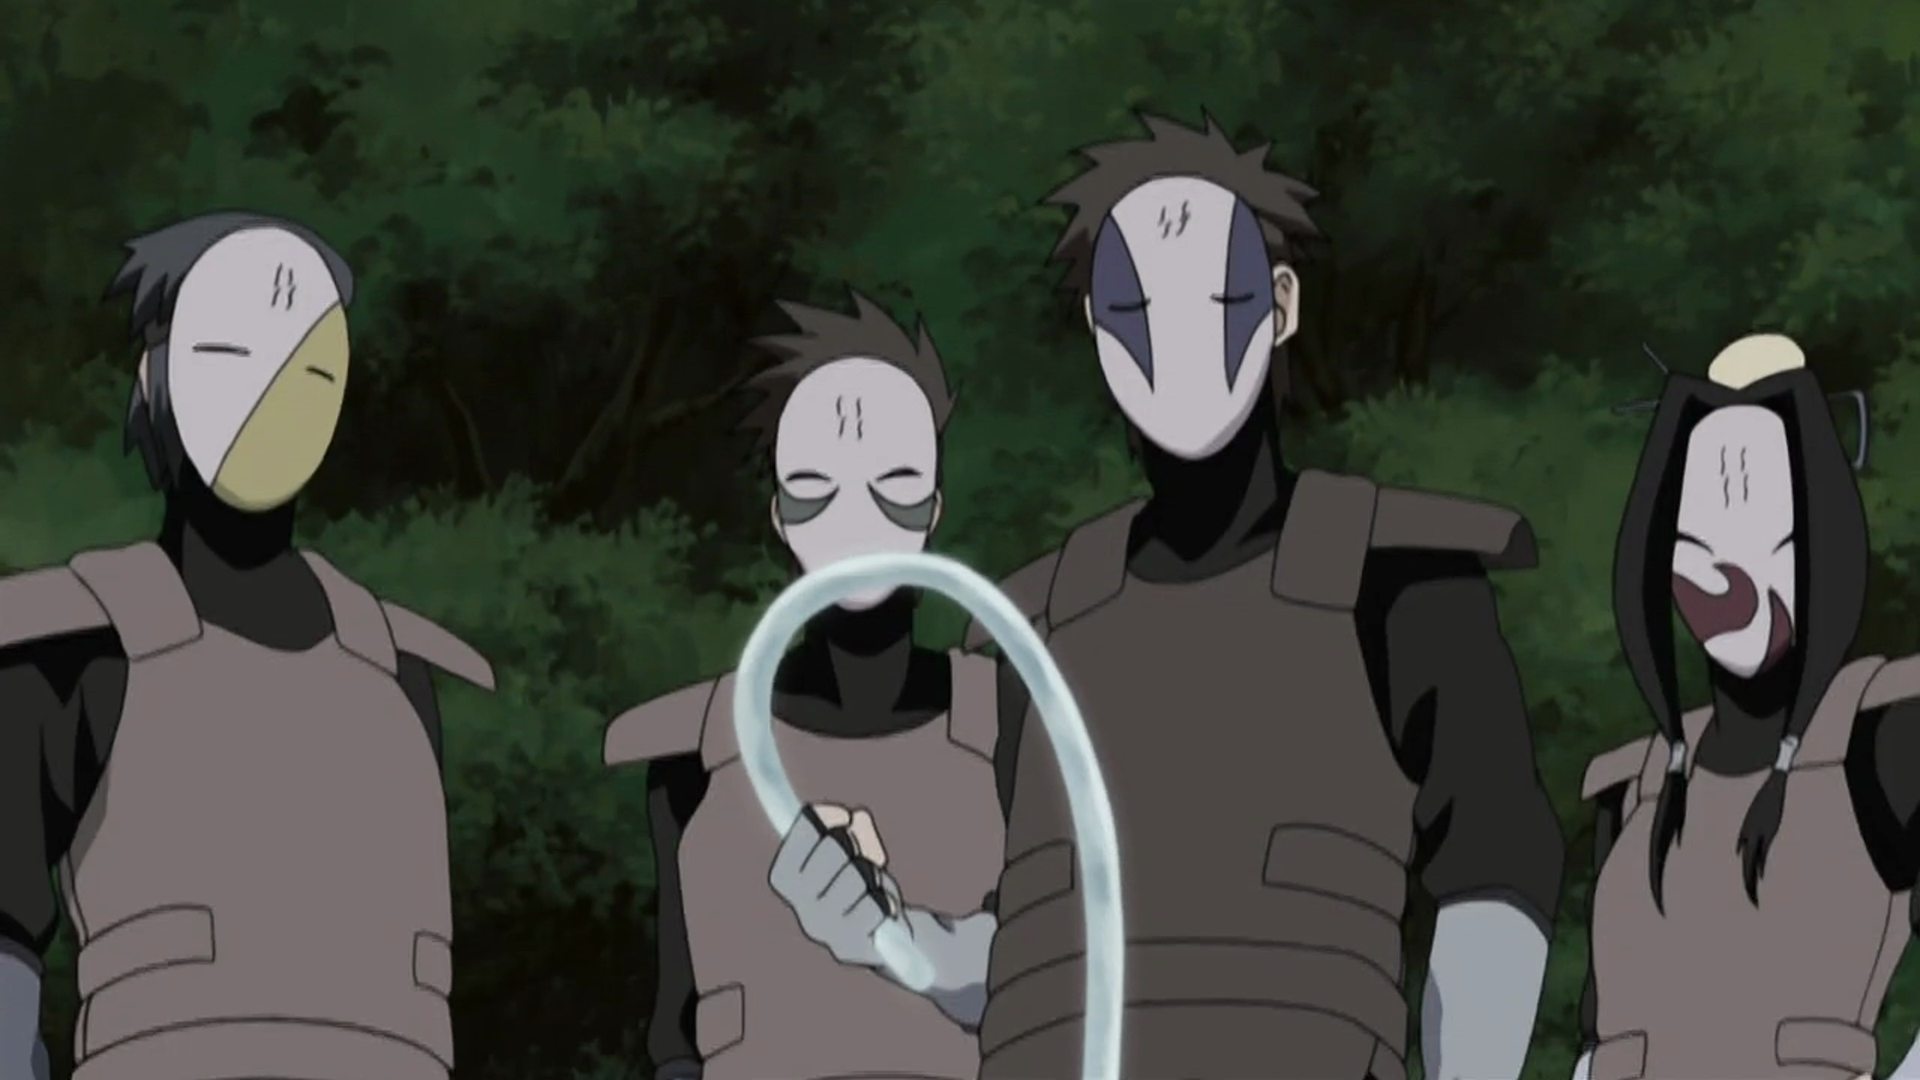 Rogue Ninja's Past | Narutopedia | FANDOM powered by Wikia